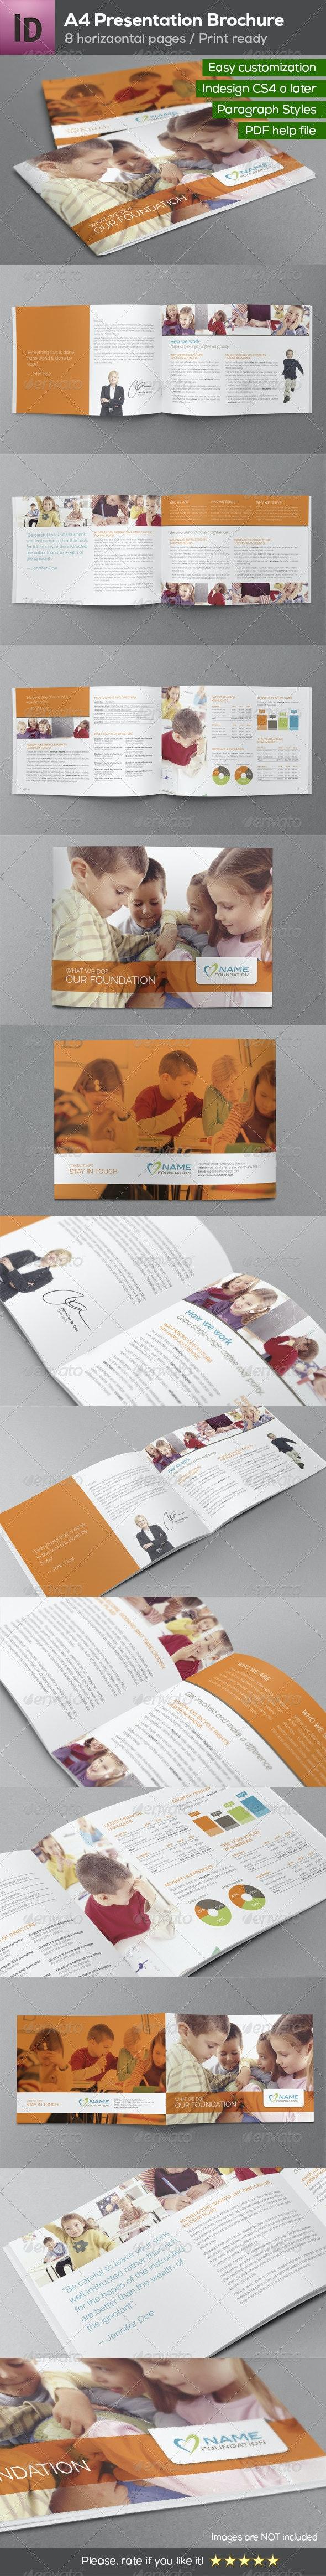 A4 Presentation Brochure 8 pages - Brochures Print Templates